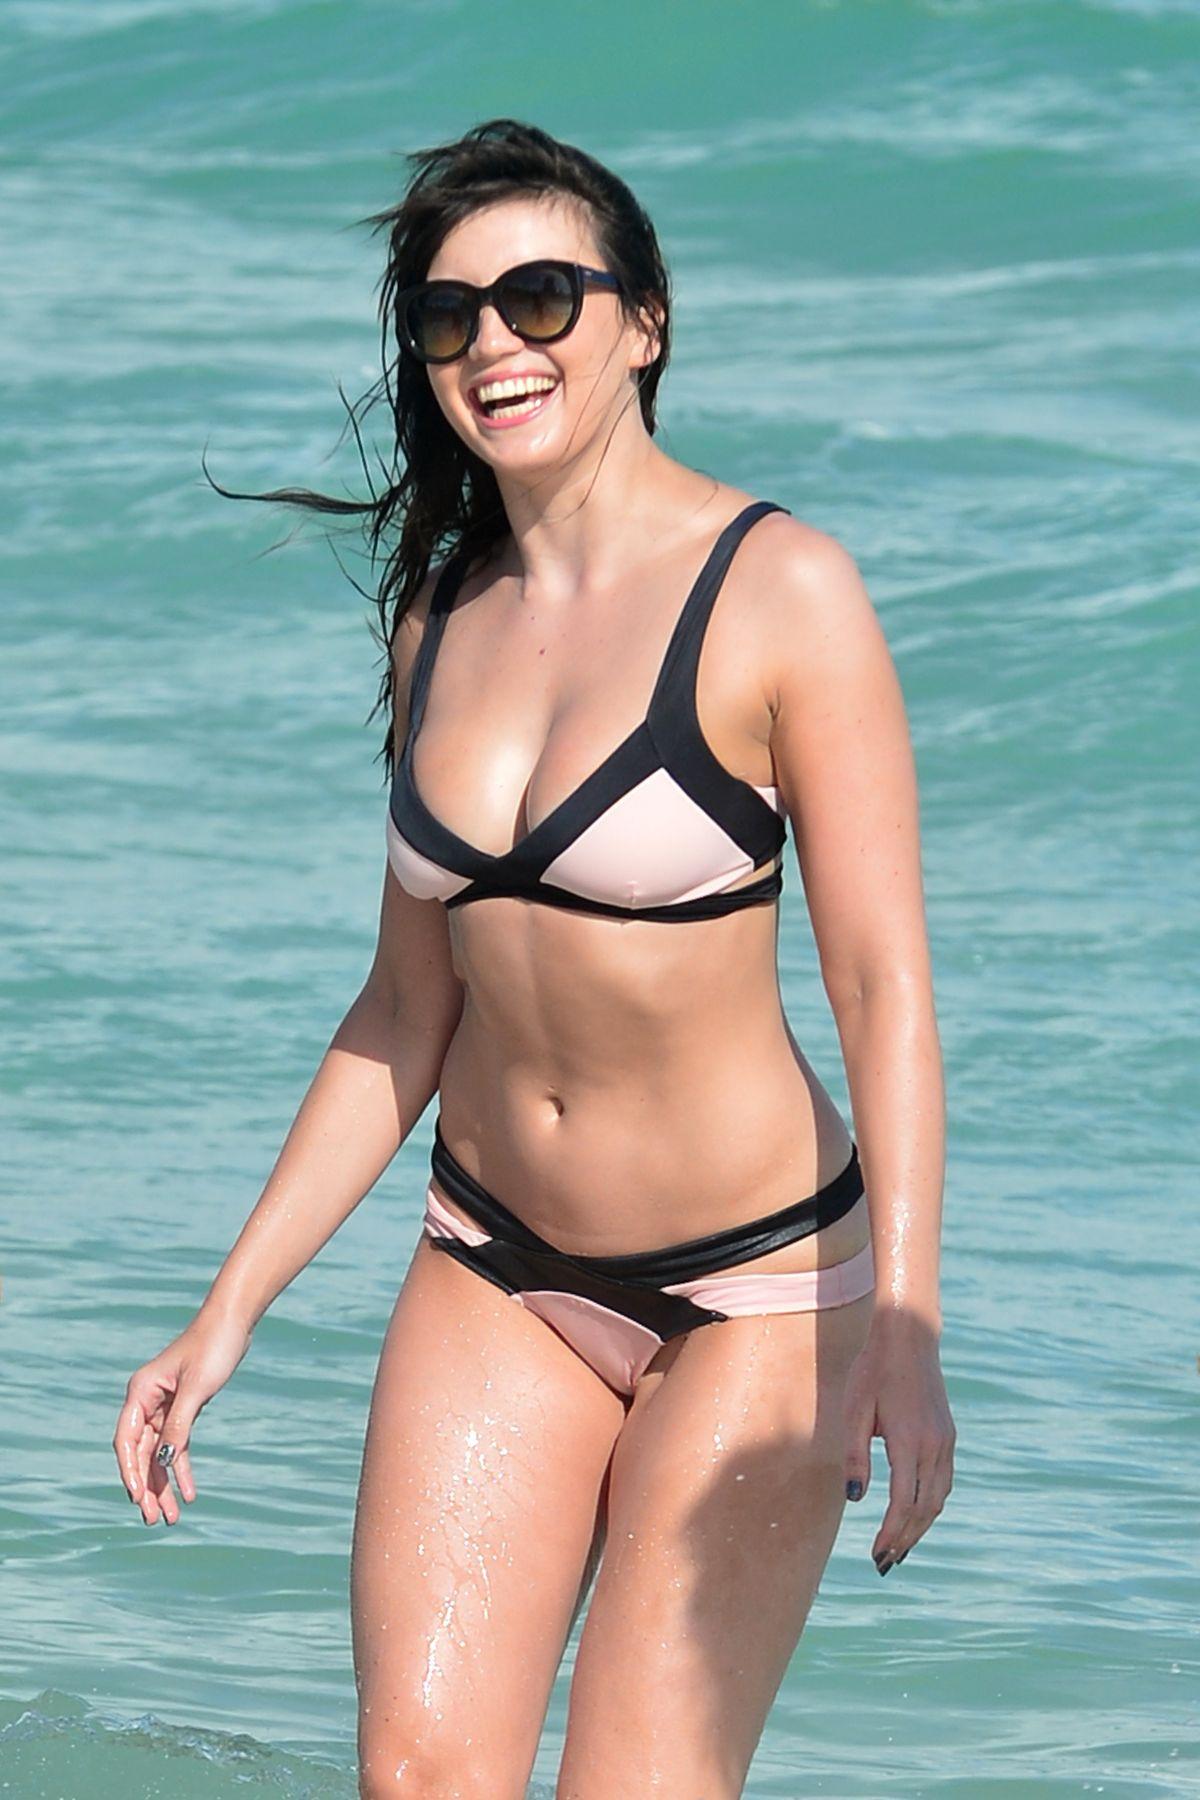 Daisy lowe bikini